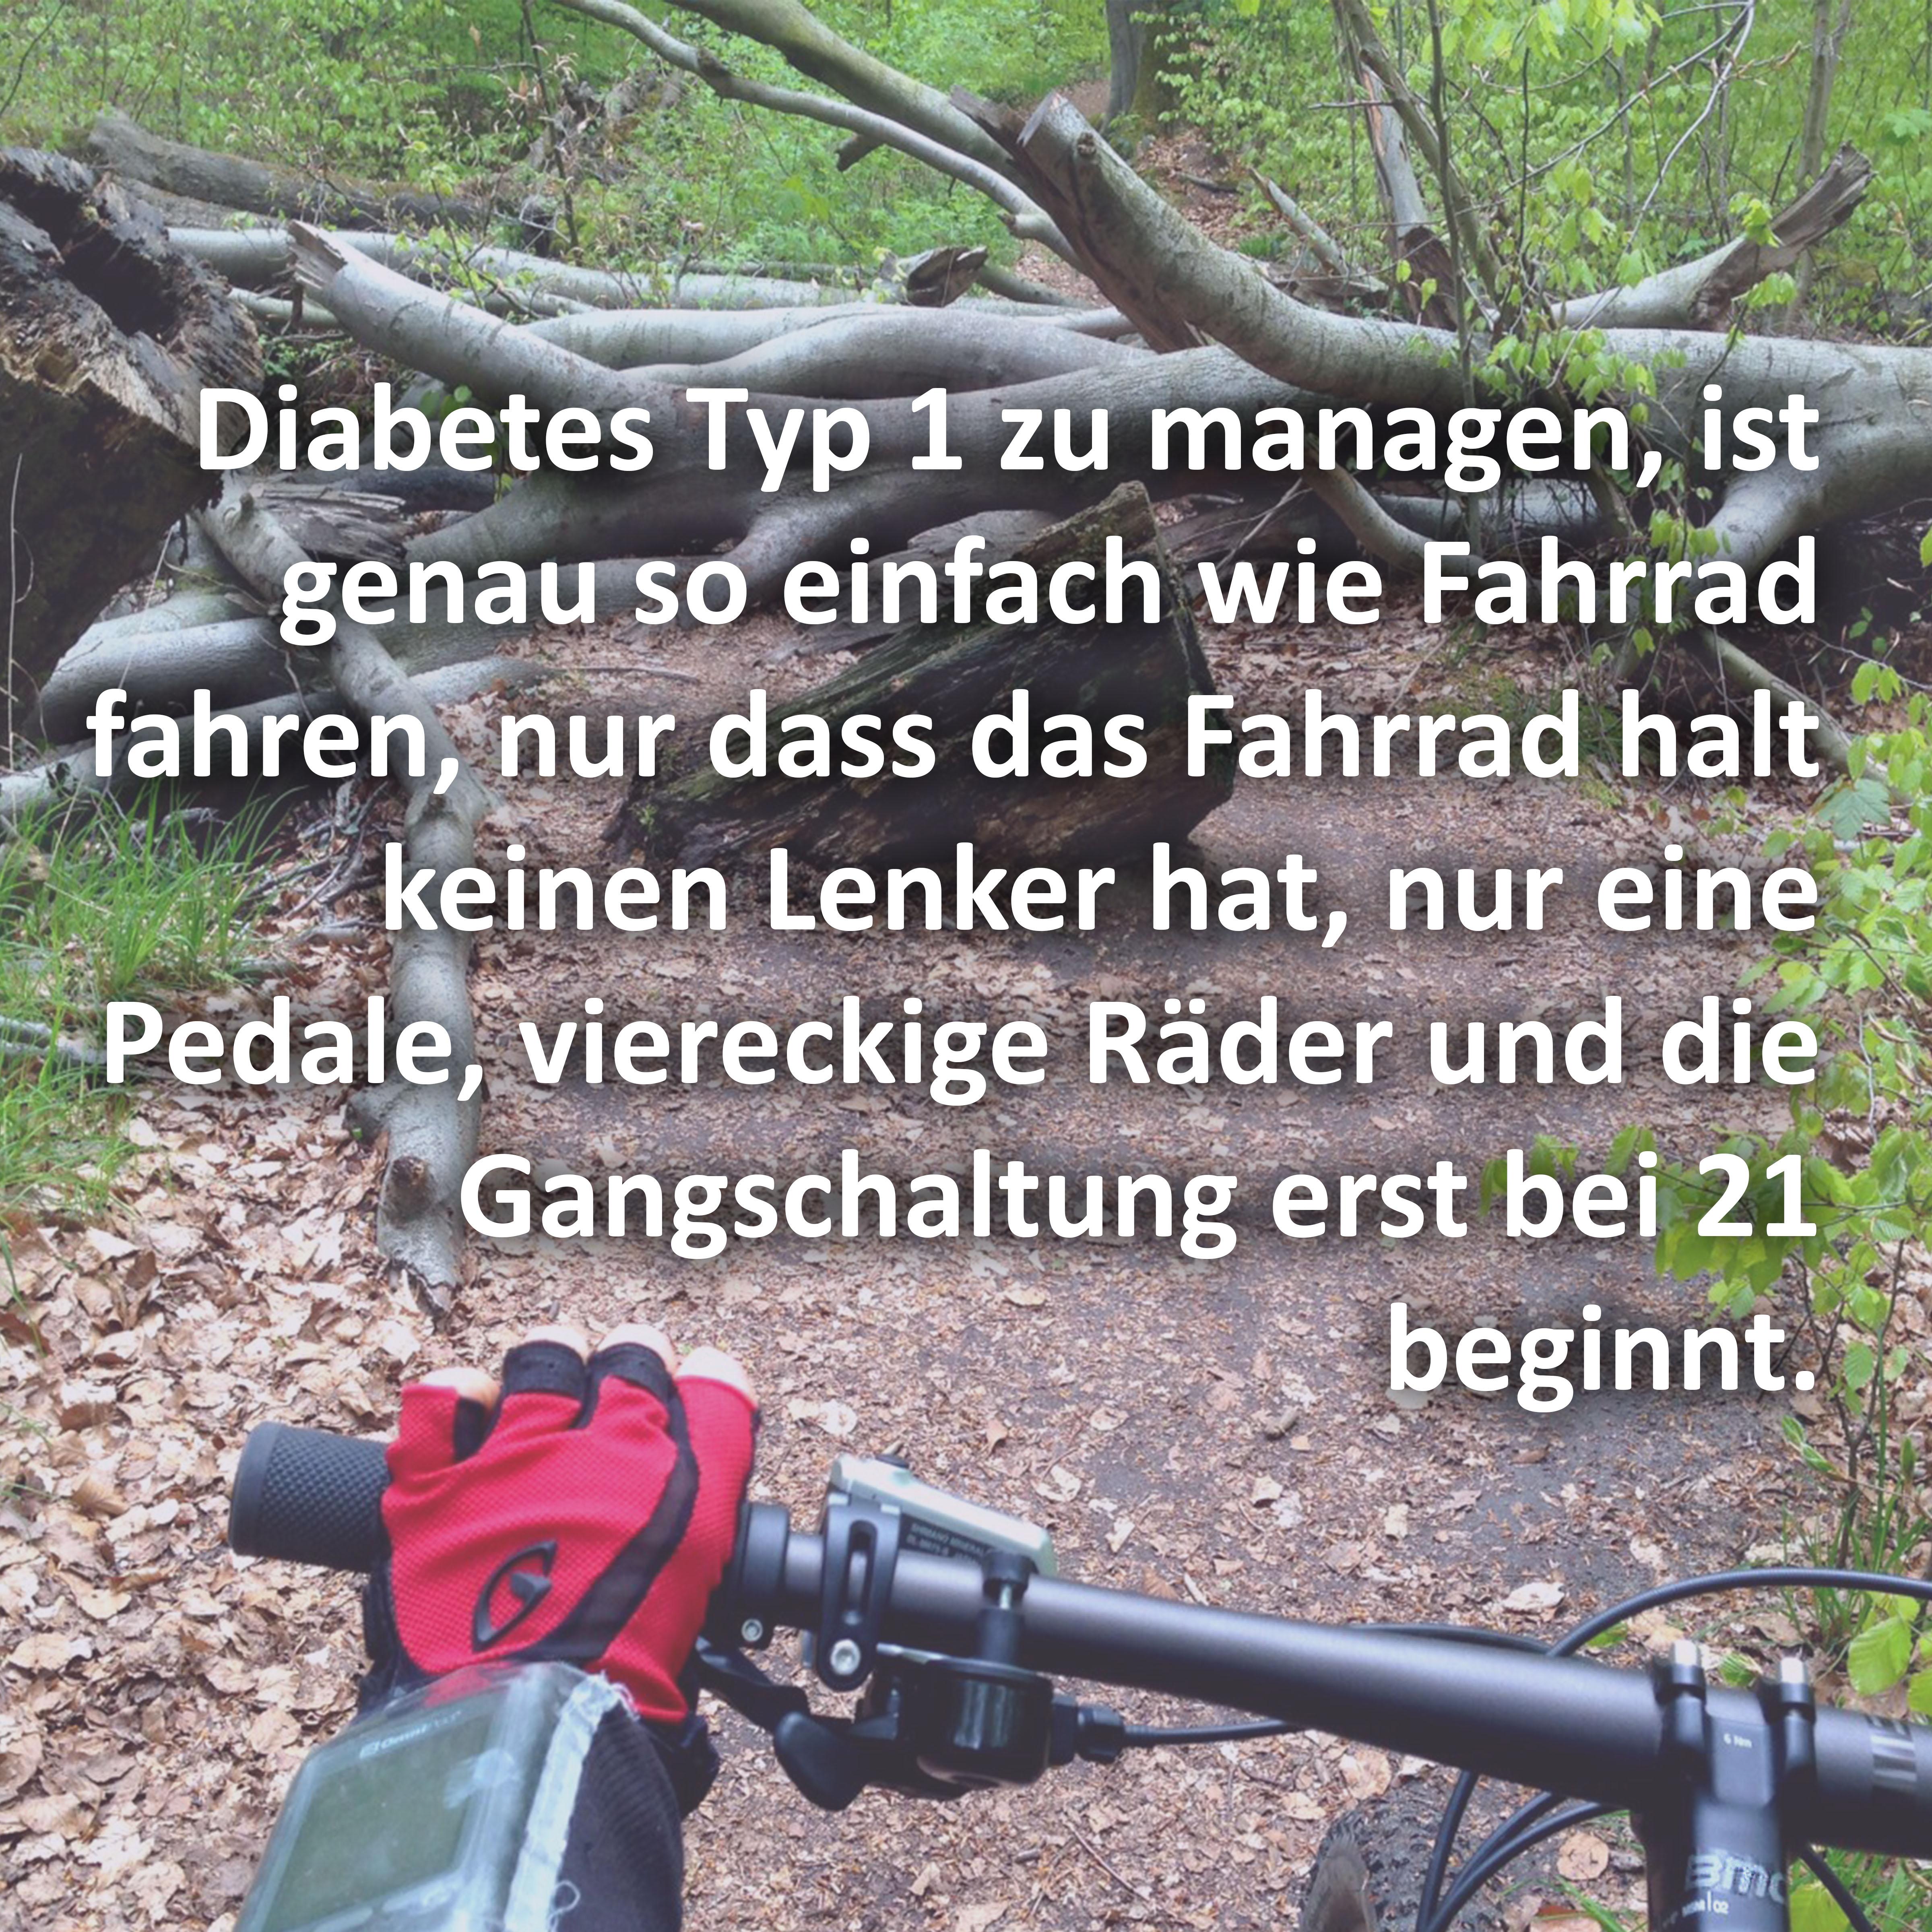 Diabetesmanagement wie Fahrradfahen